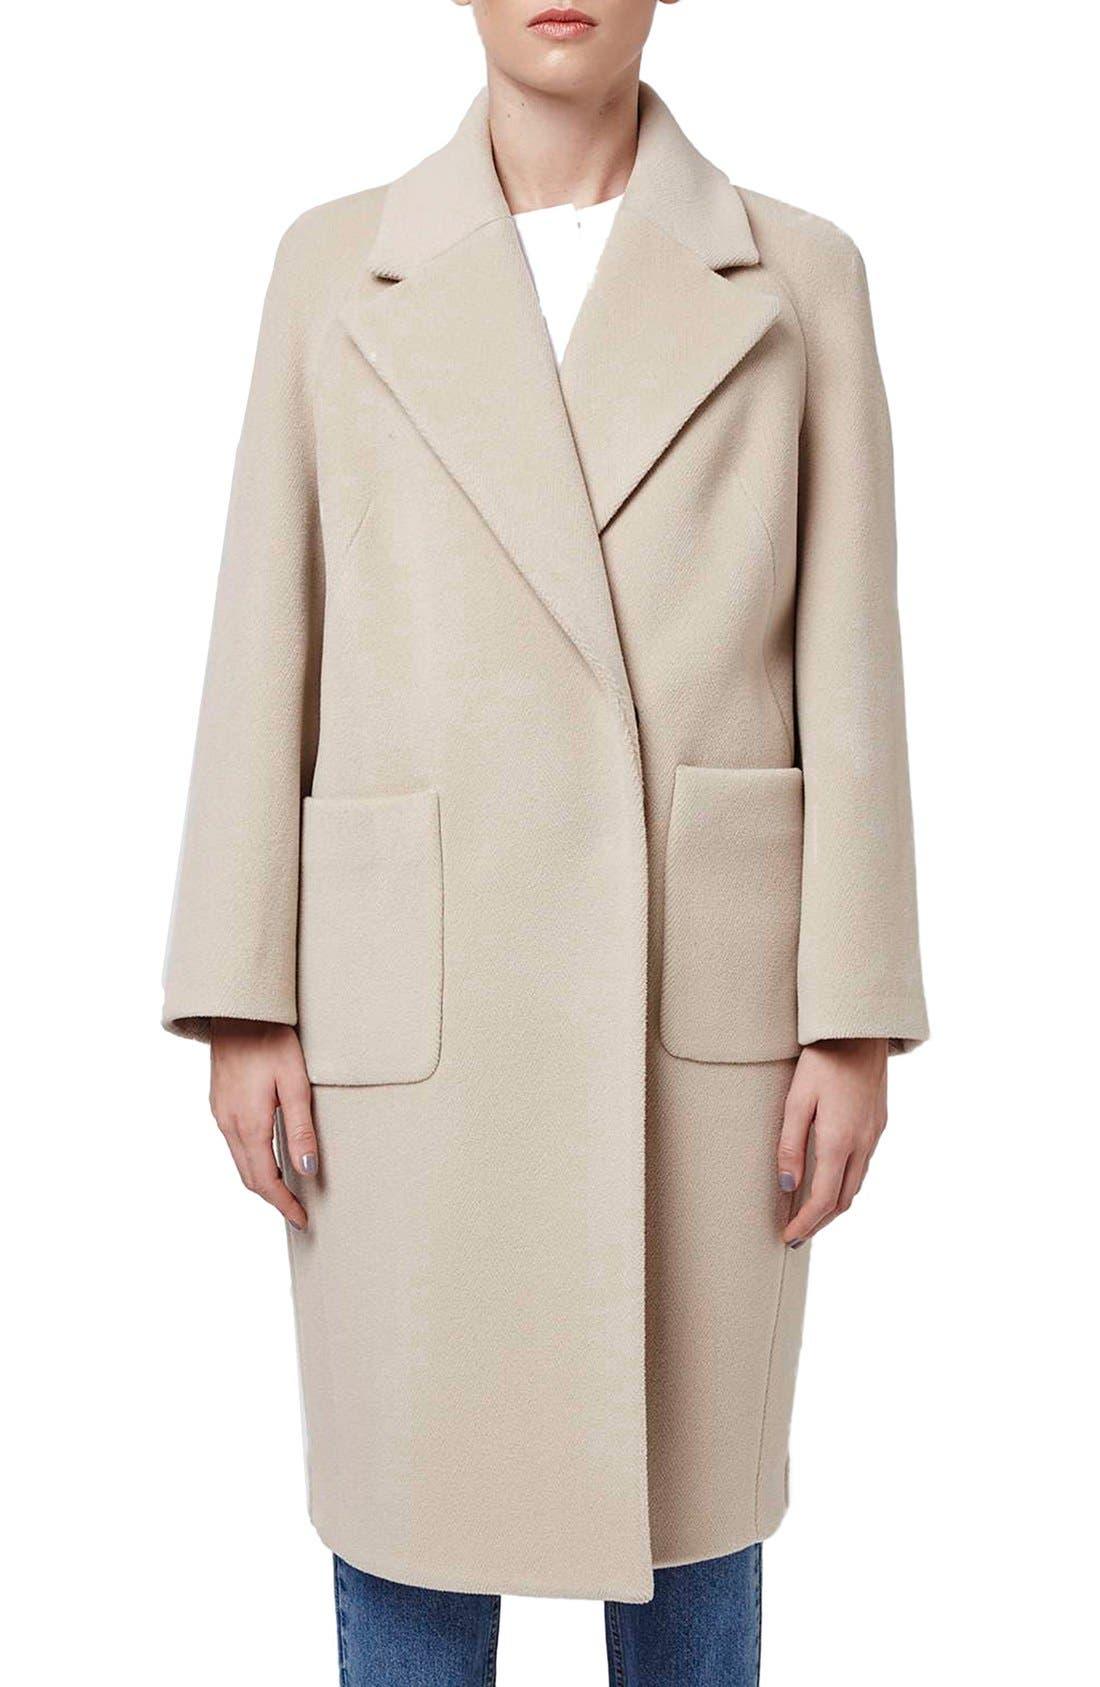 Alternate Image 1 Selected - Topshop Boutique Longline Wool Coat